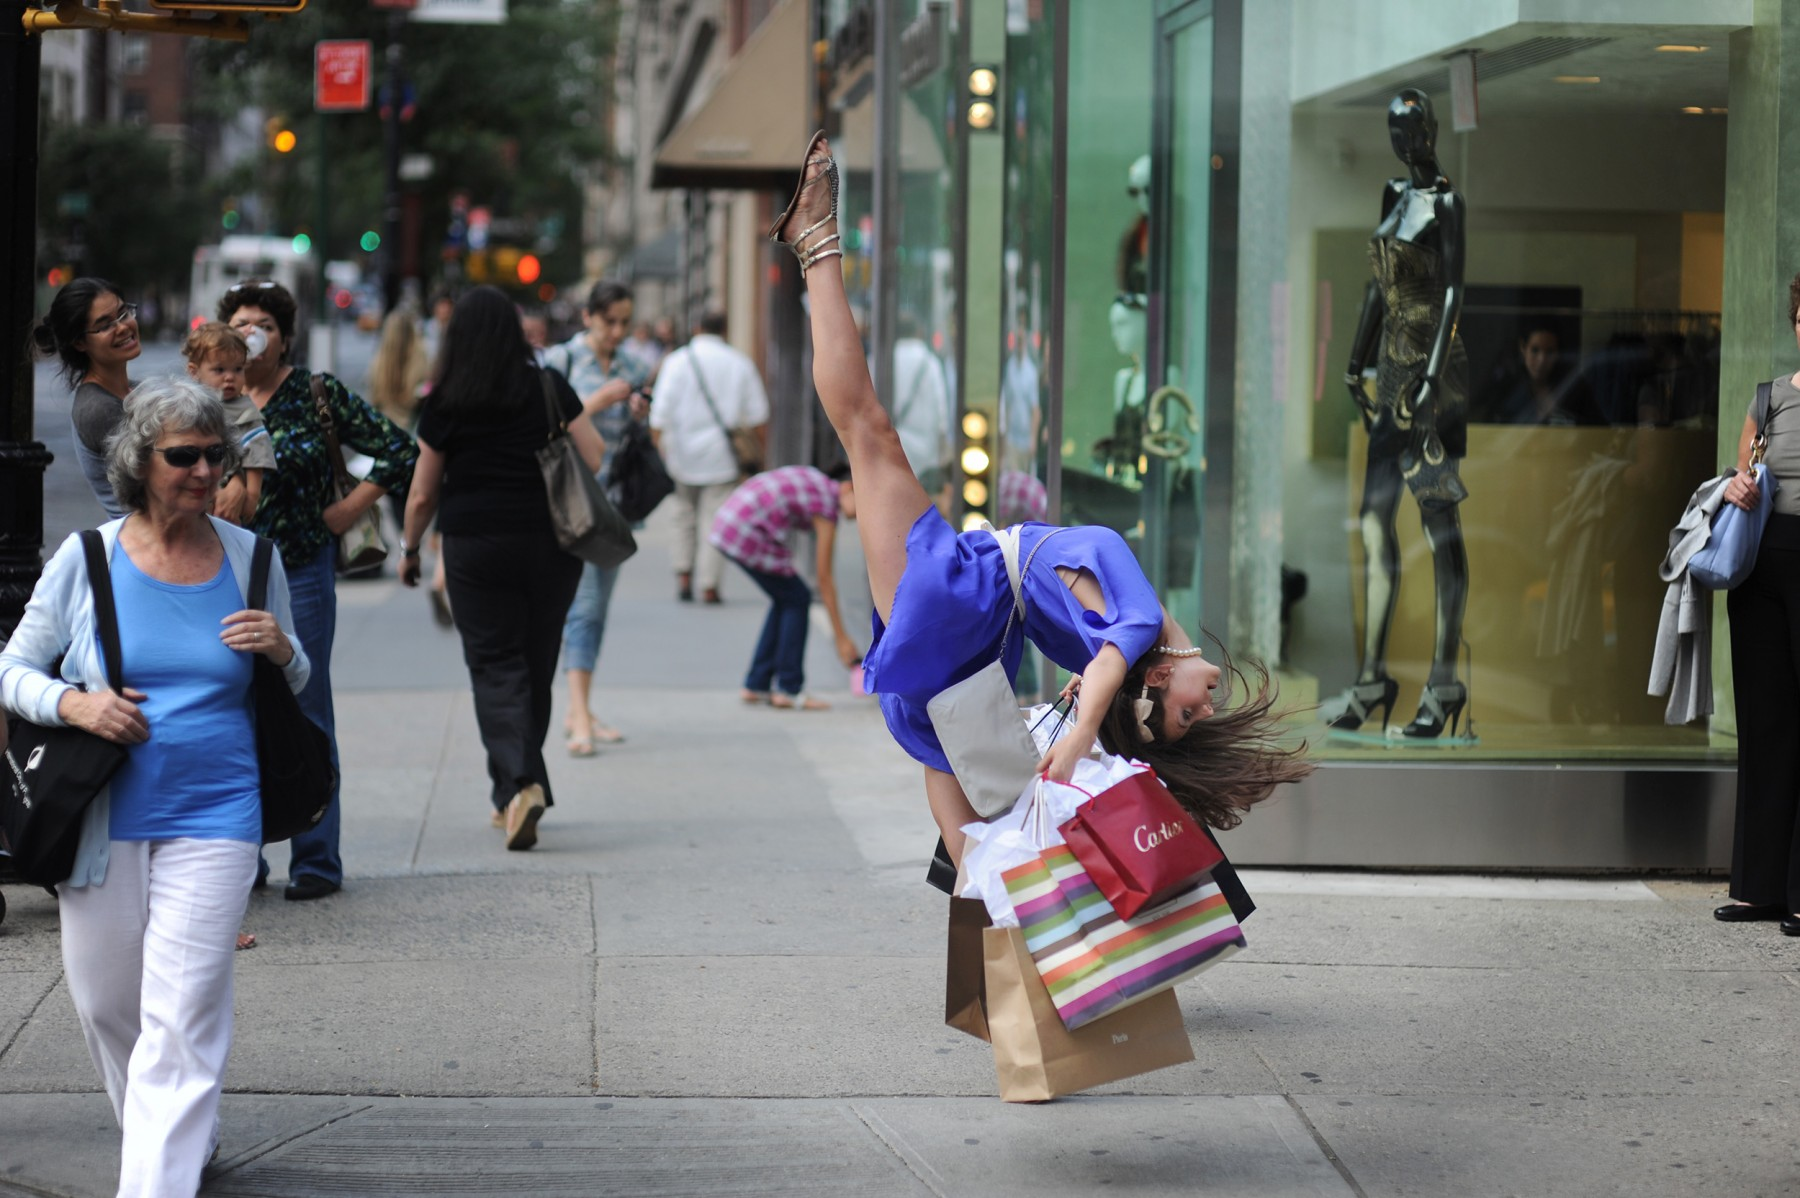 People having sex on the street